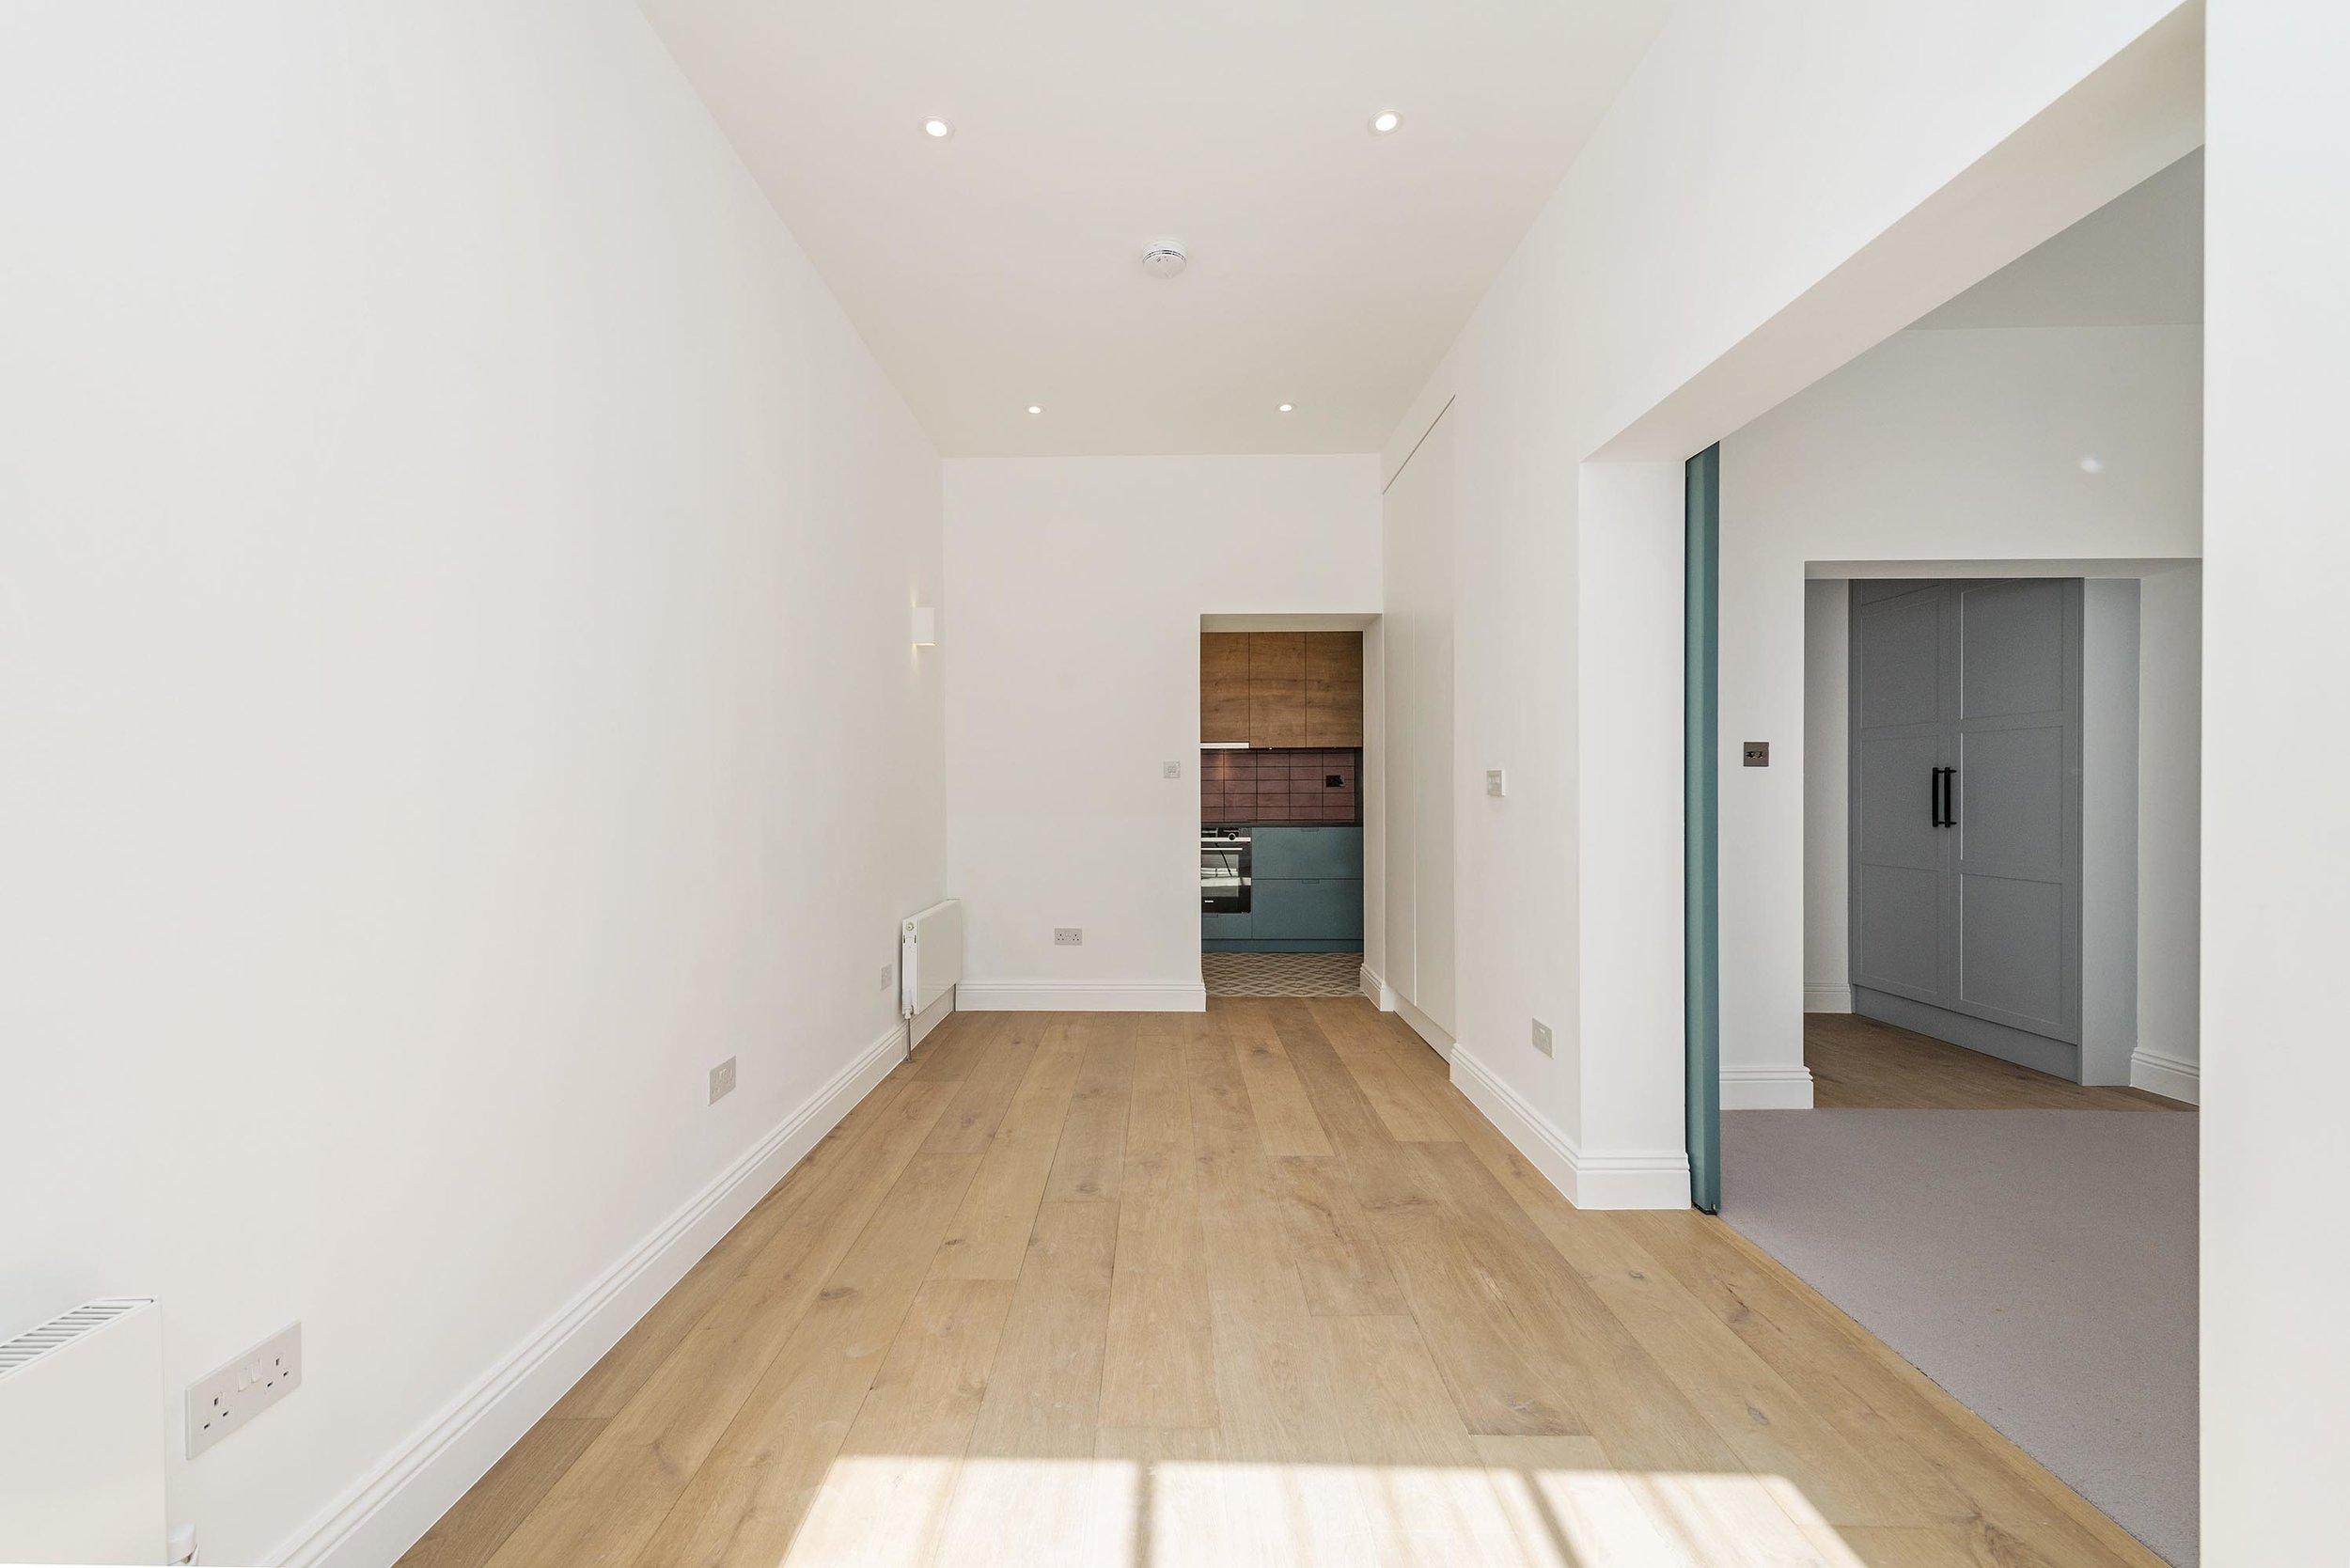 west-london-property-refurbishment-cato-creative